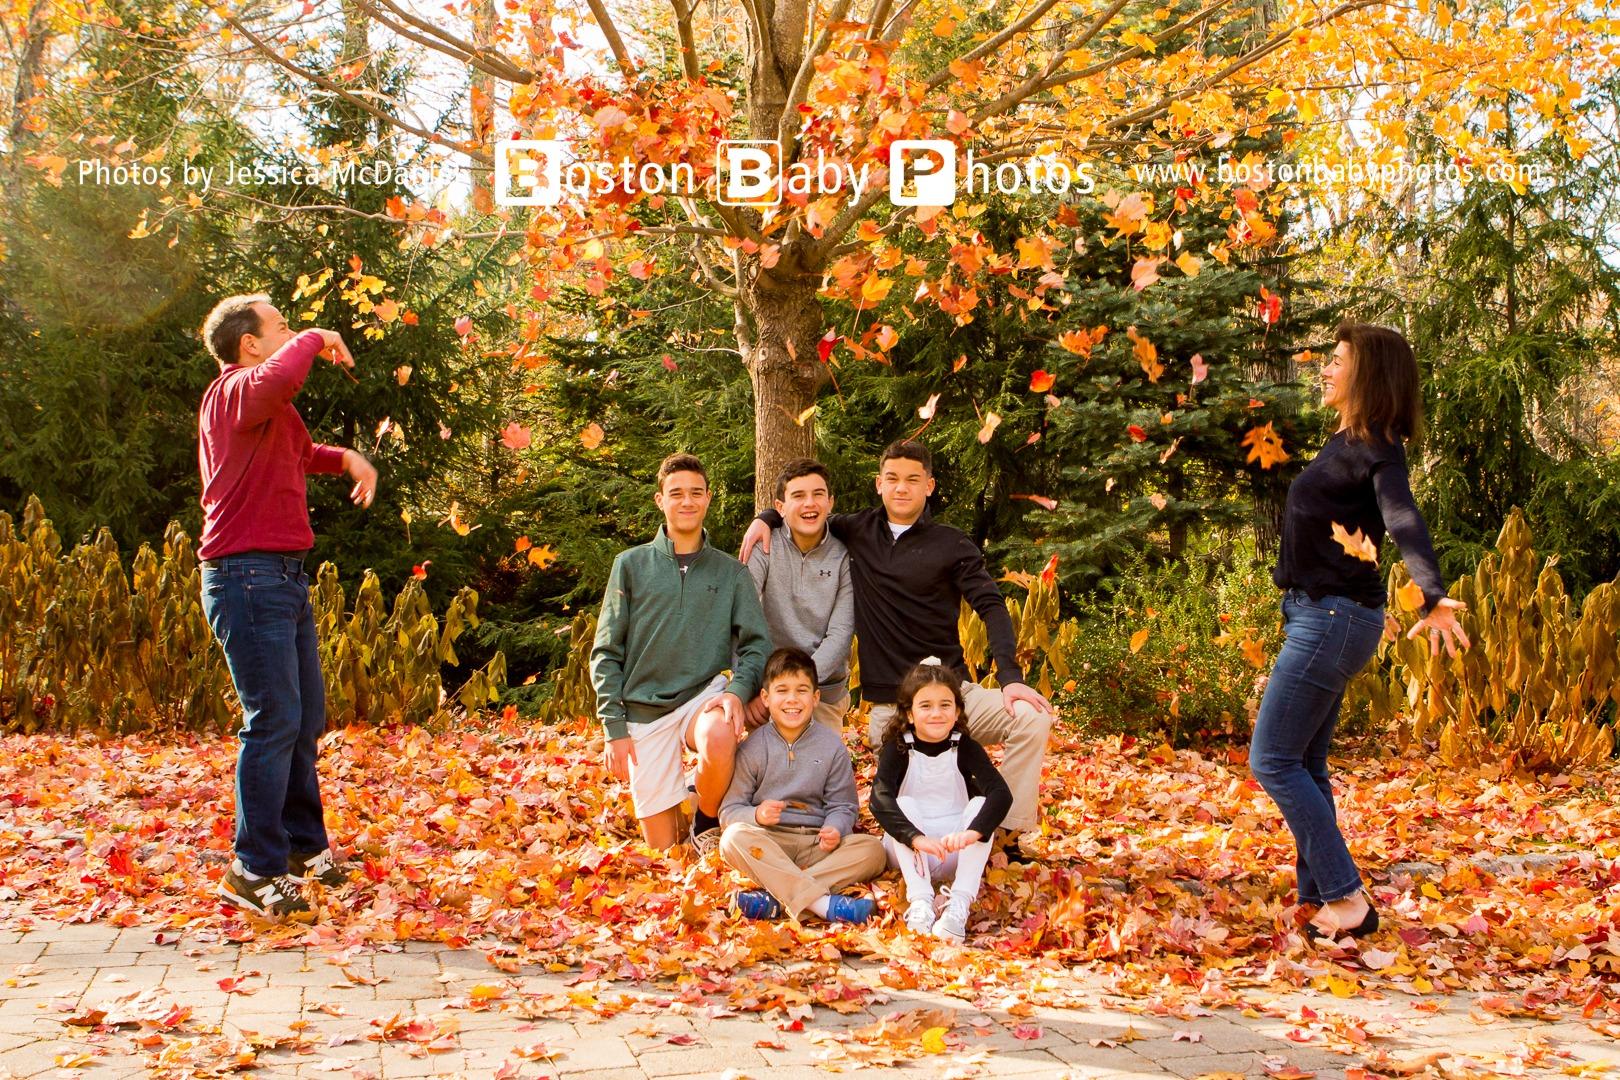 Weston, MA: An older kids photoshoot with five kids